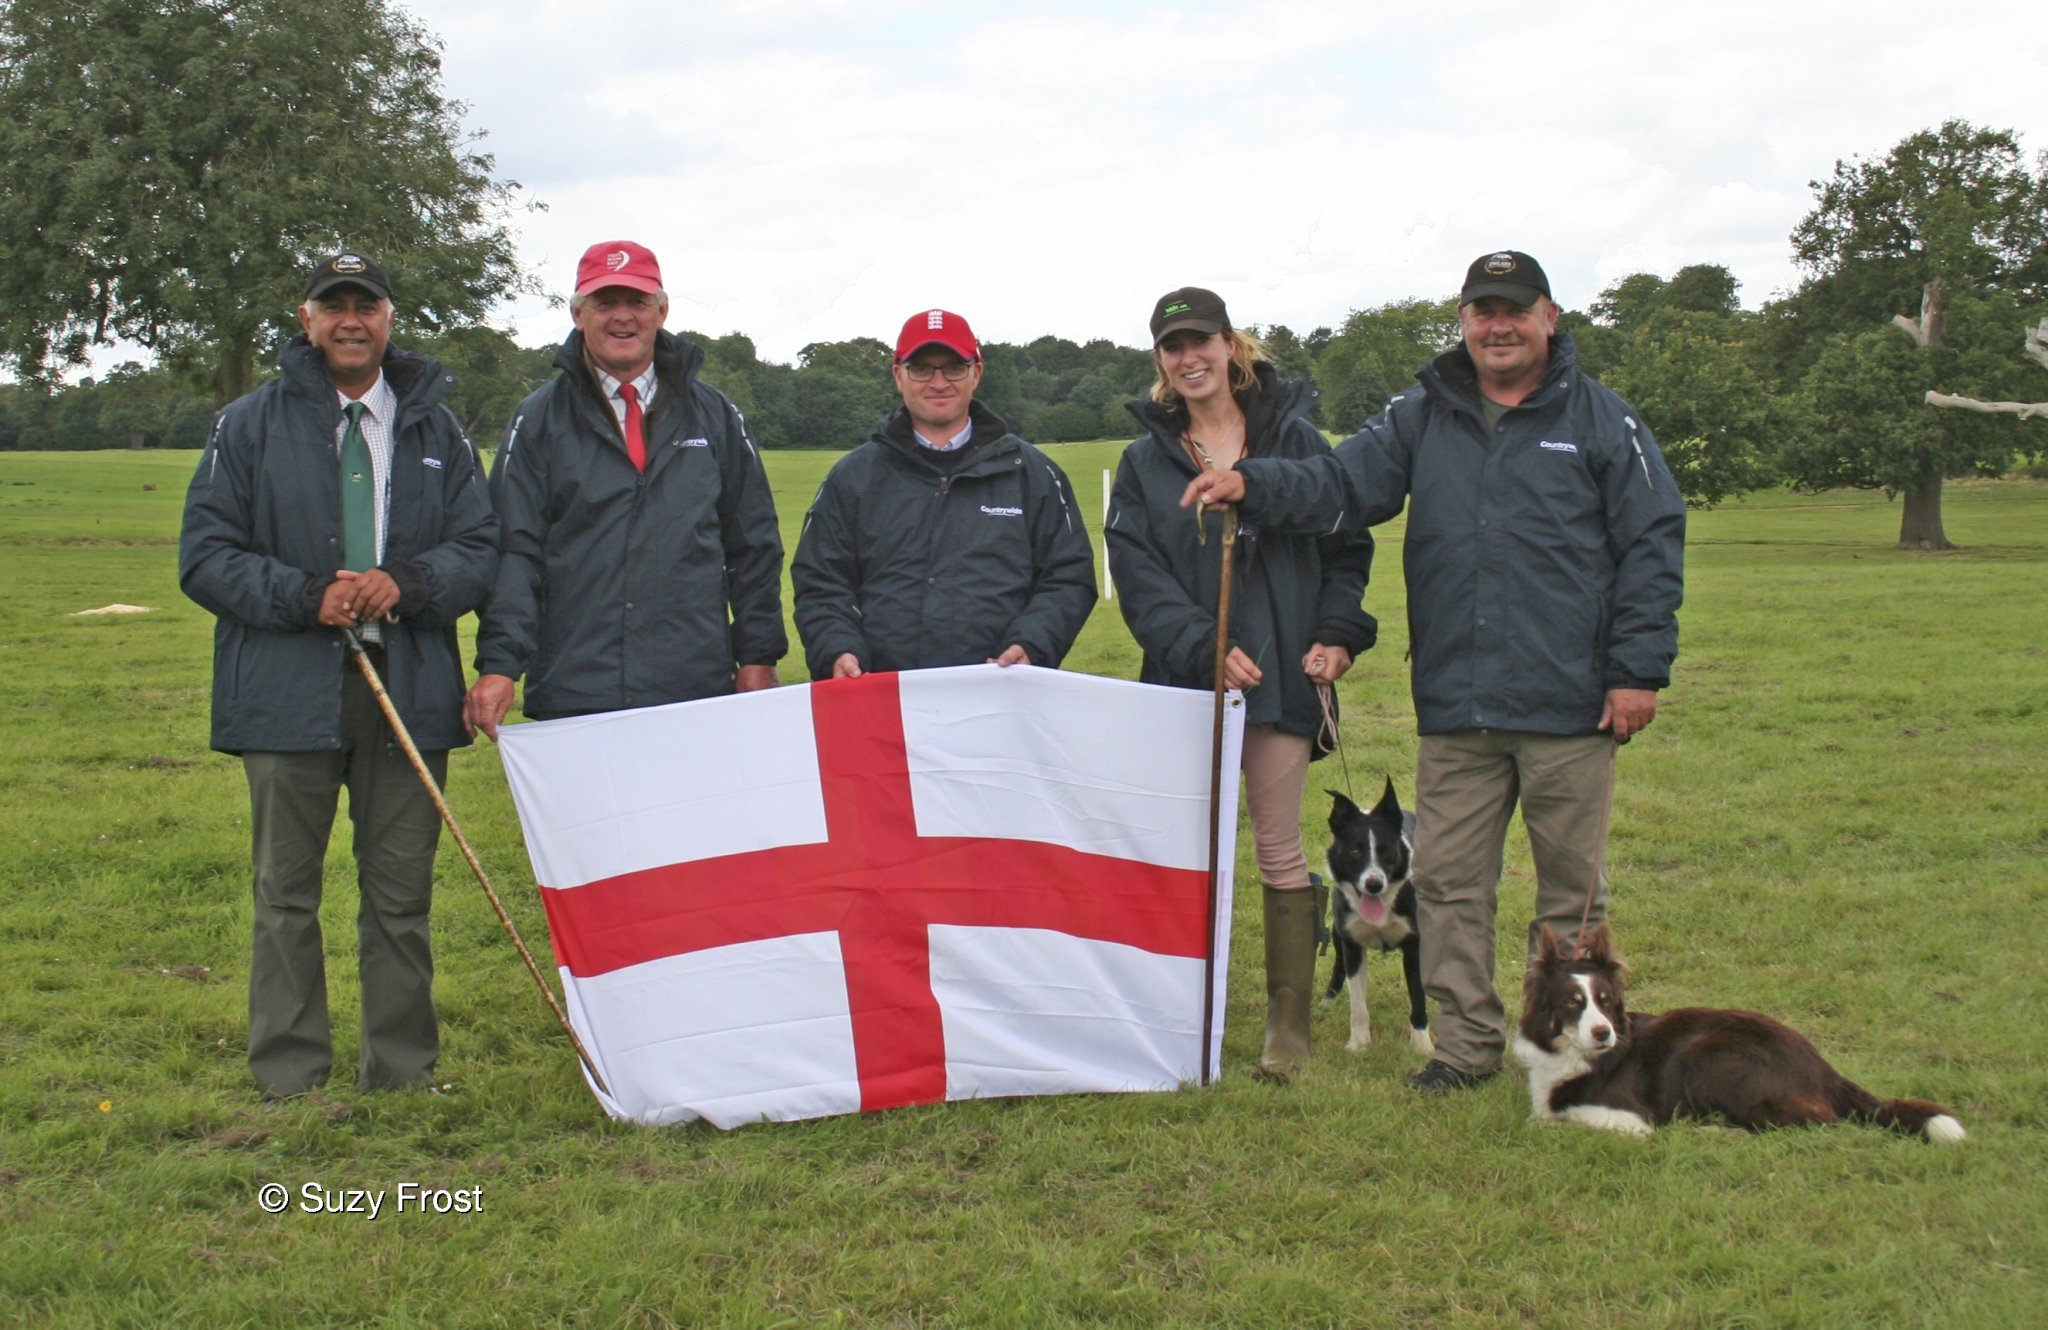 England World Trial winners 2017